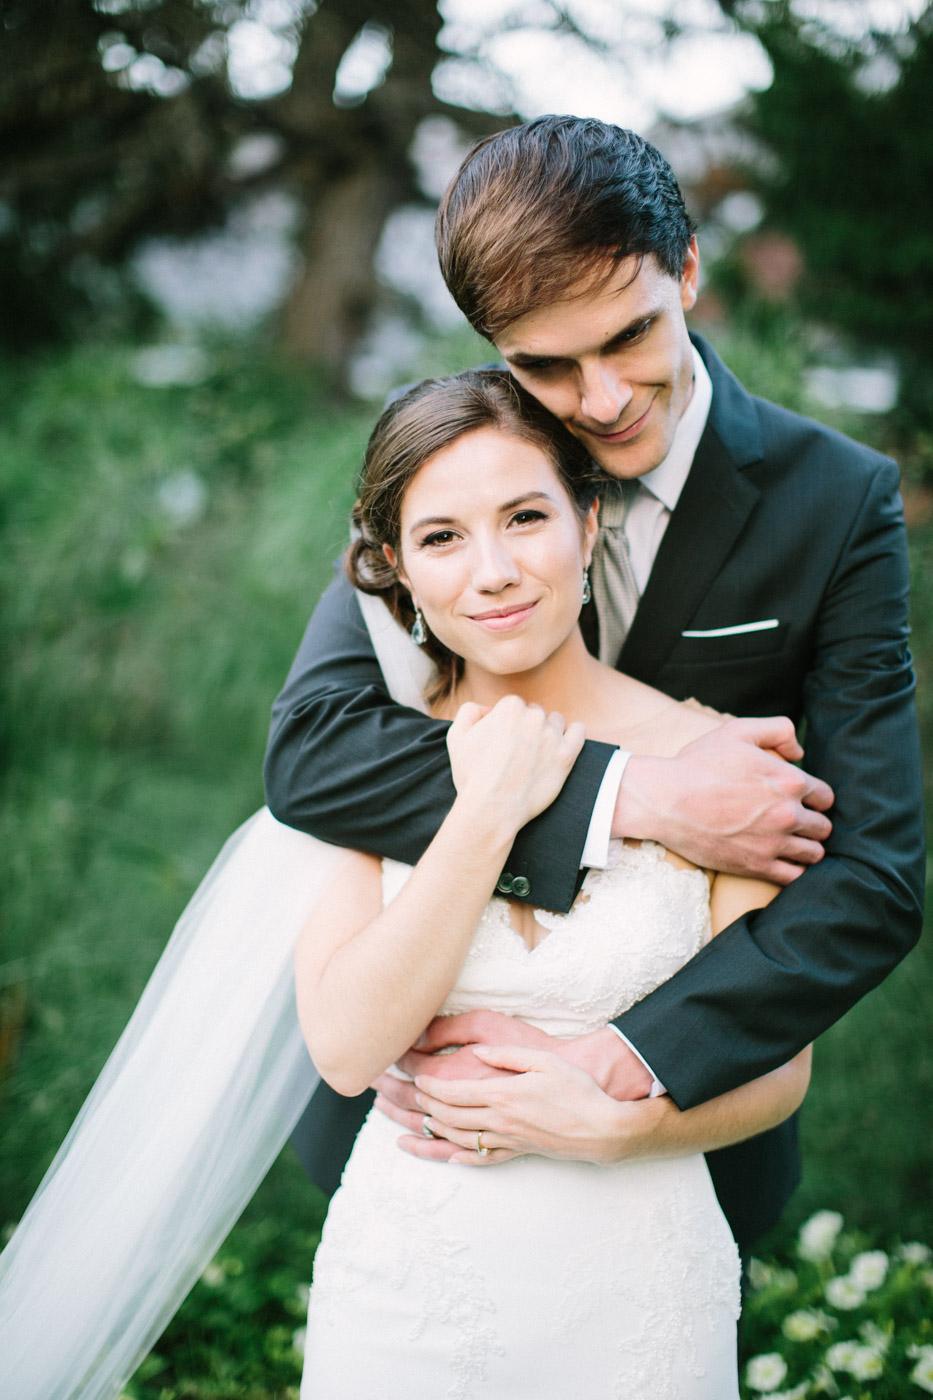 Kelly & Ben Wedding Web 2016-435.jpg